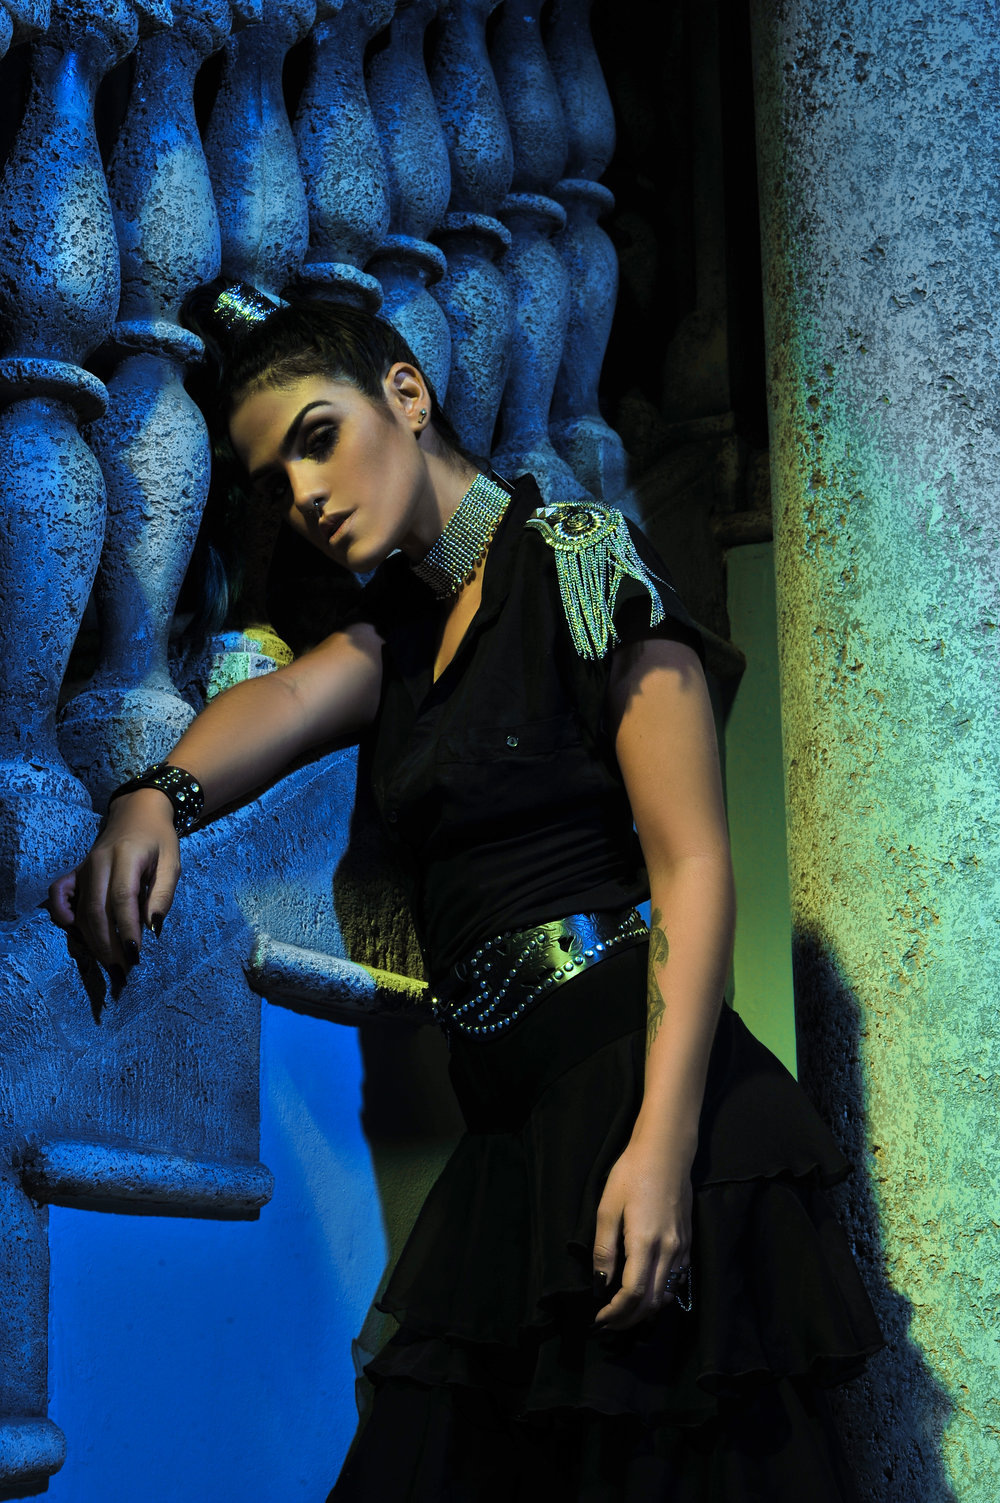 model-beefiyaa-art-crazy-photo-g-photography-fashion-stylist-illy-perez10.JPG